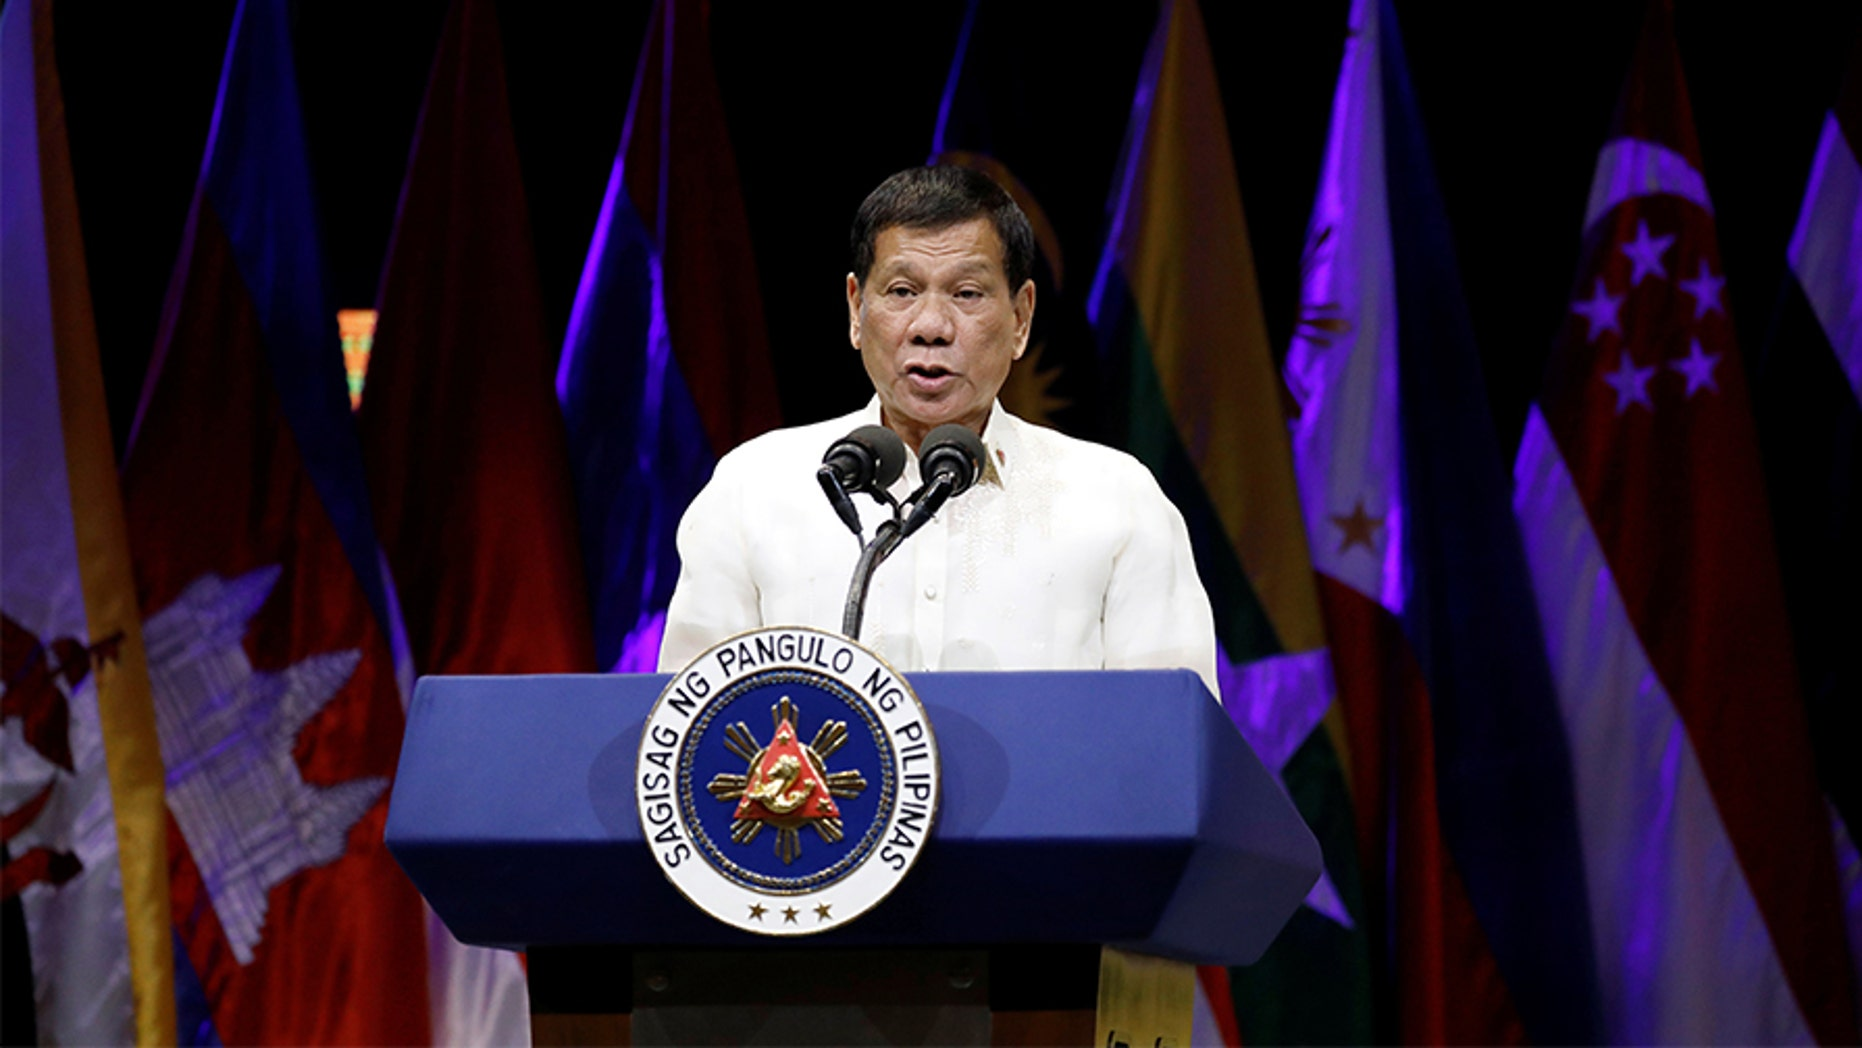 Philippine President Rodrigo Duterte has said he would be willing to shoot criminals himself.